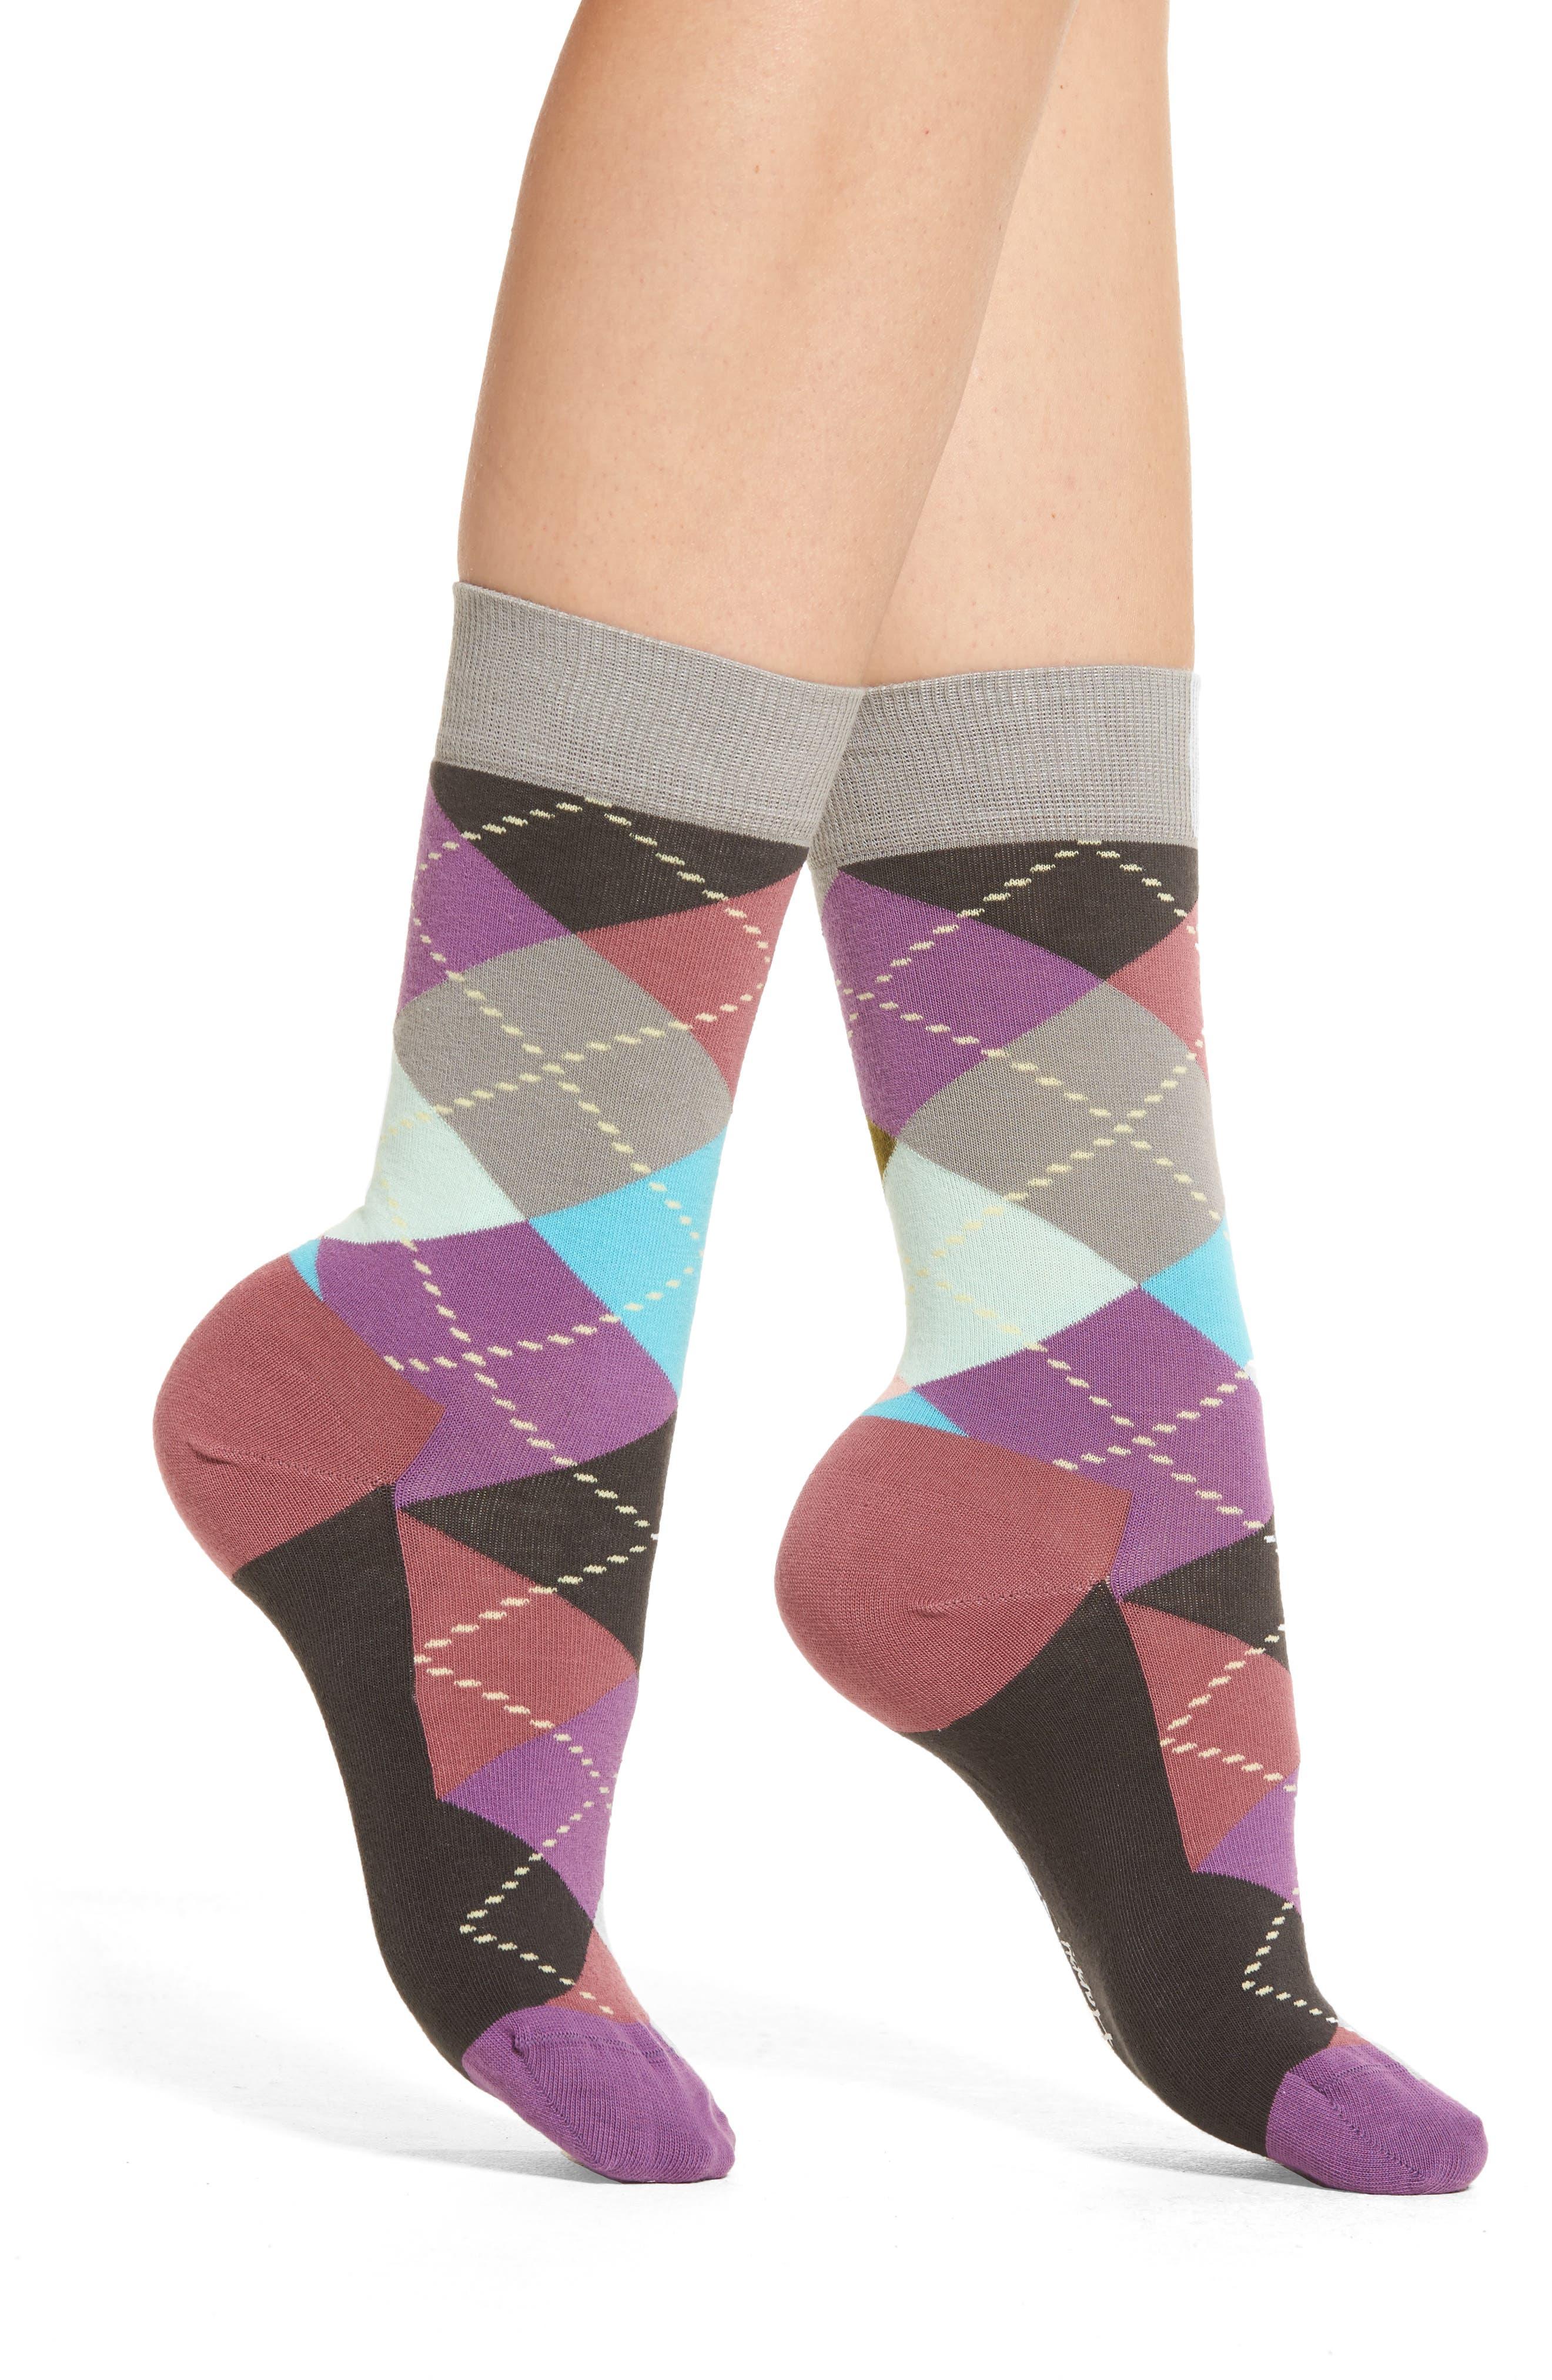 mens comfort s hidden socks ghost comforter neutral running shoes l balega brooks men